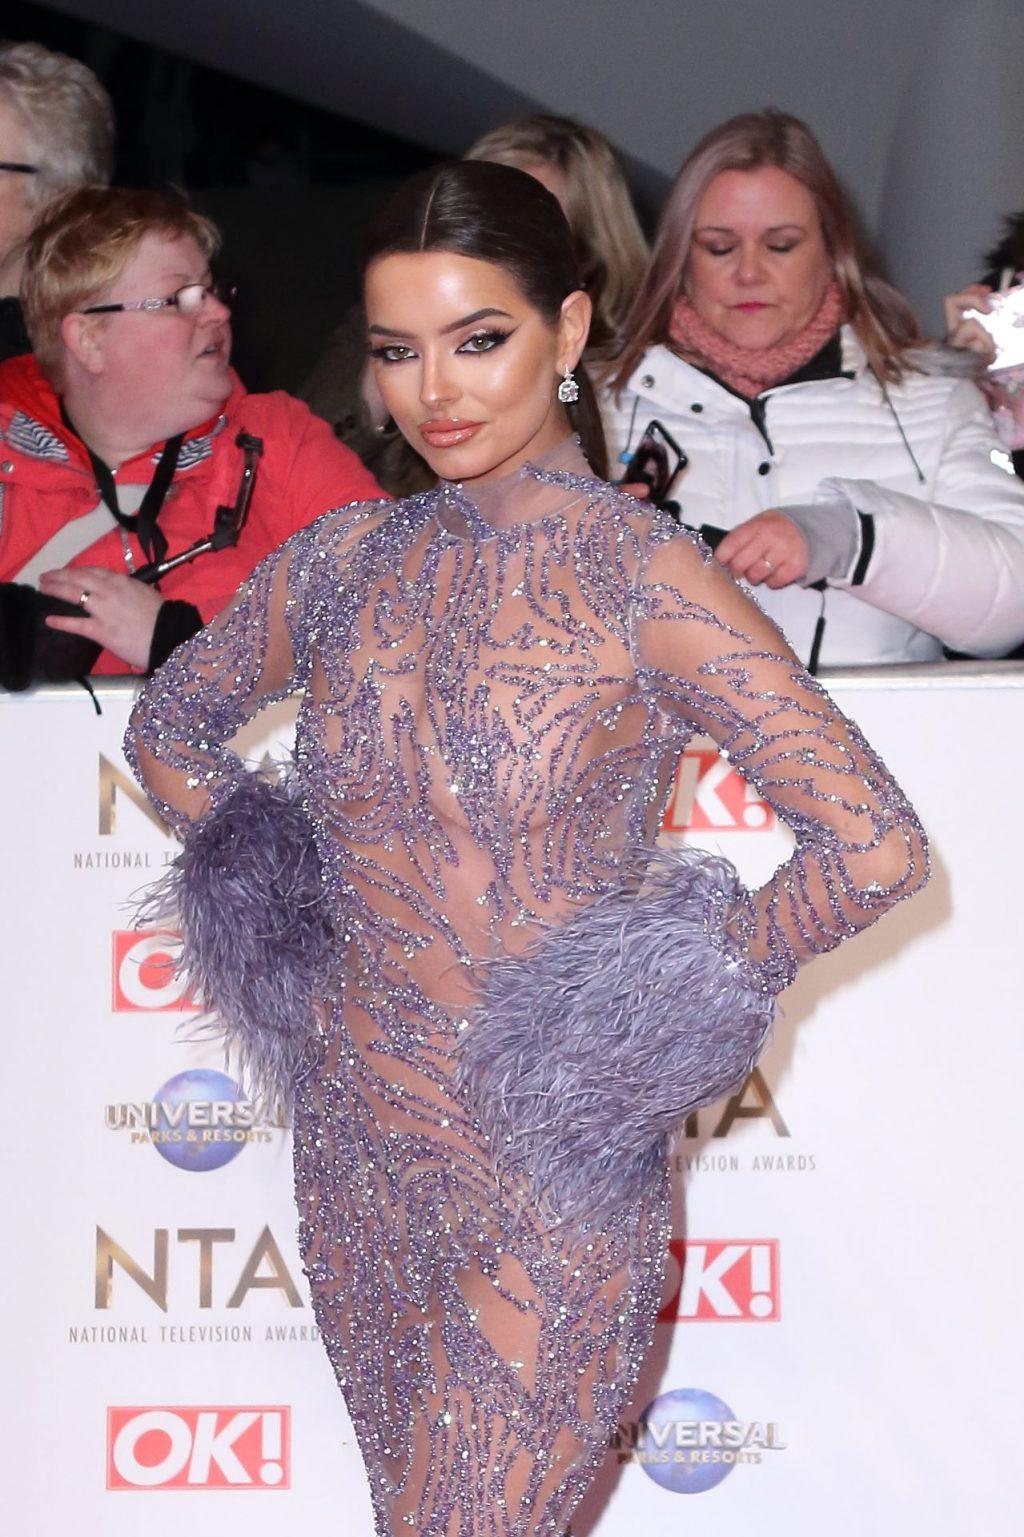 Maura Higgins Looks Hot at the National Television Awards (16 Photos)